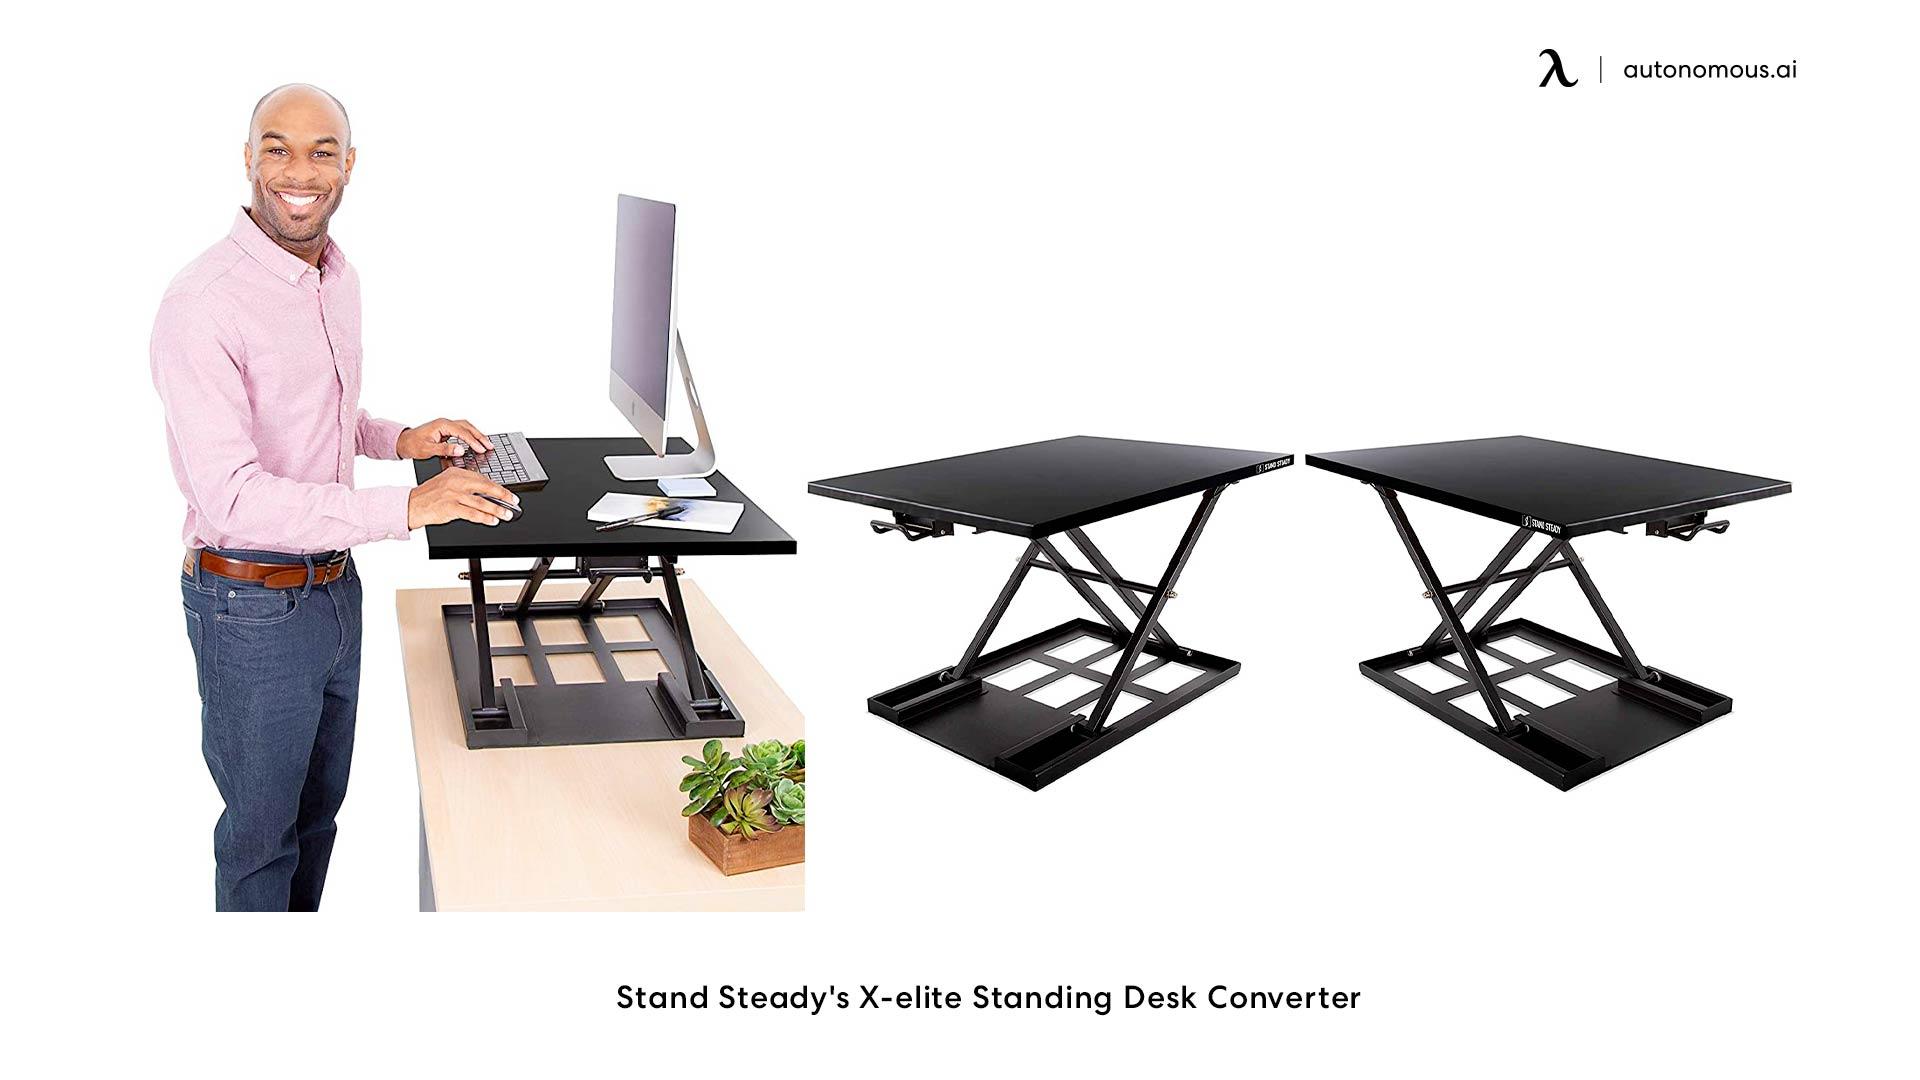 Stand Steady's X-elite Standing Desk Converter